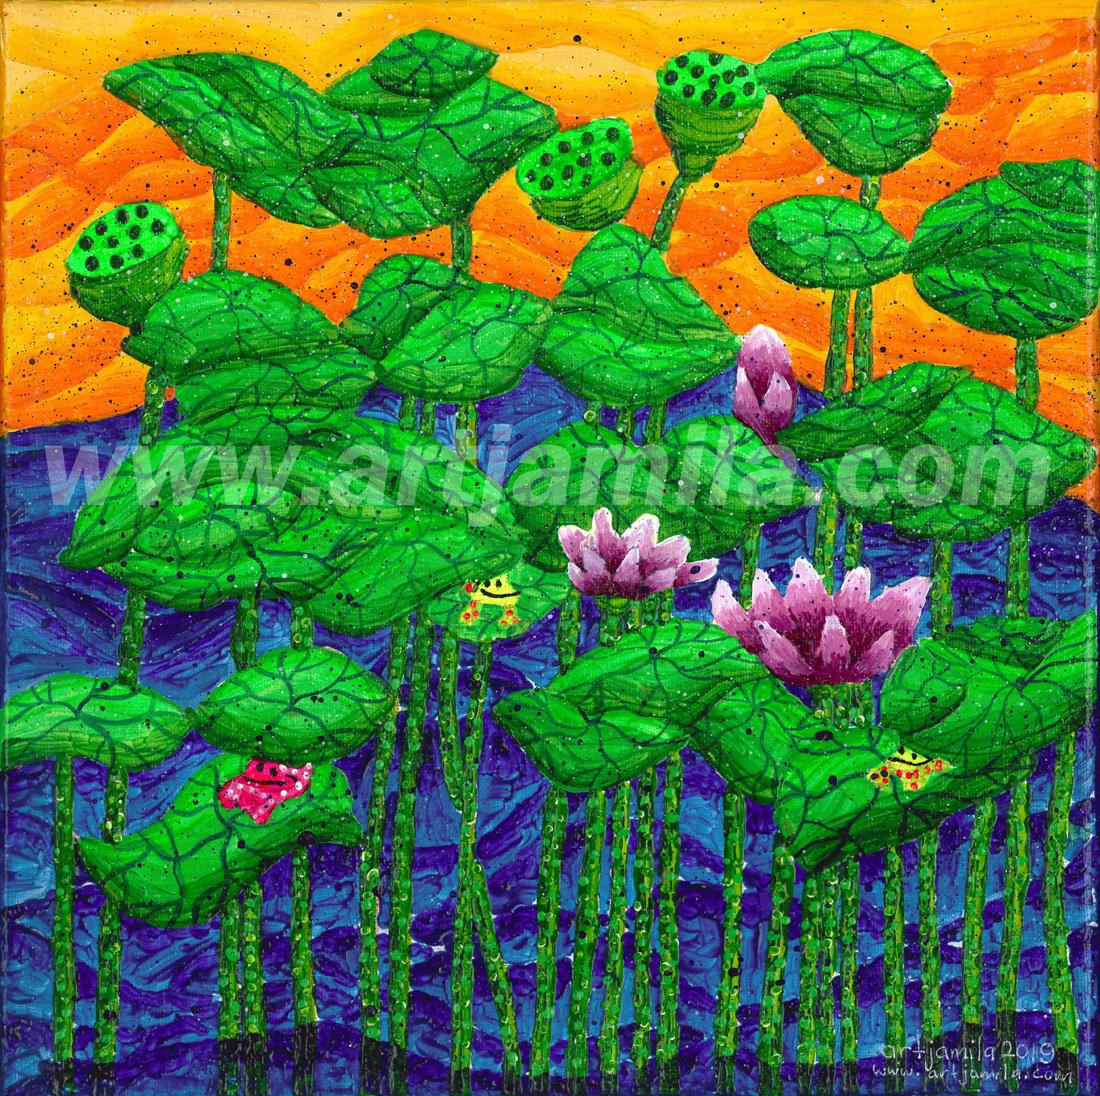 Garden of Lotus Series 2A. Watermark